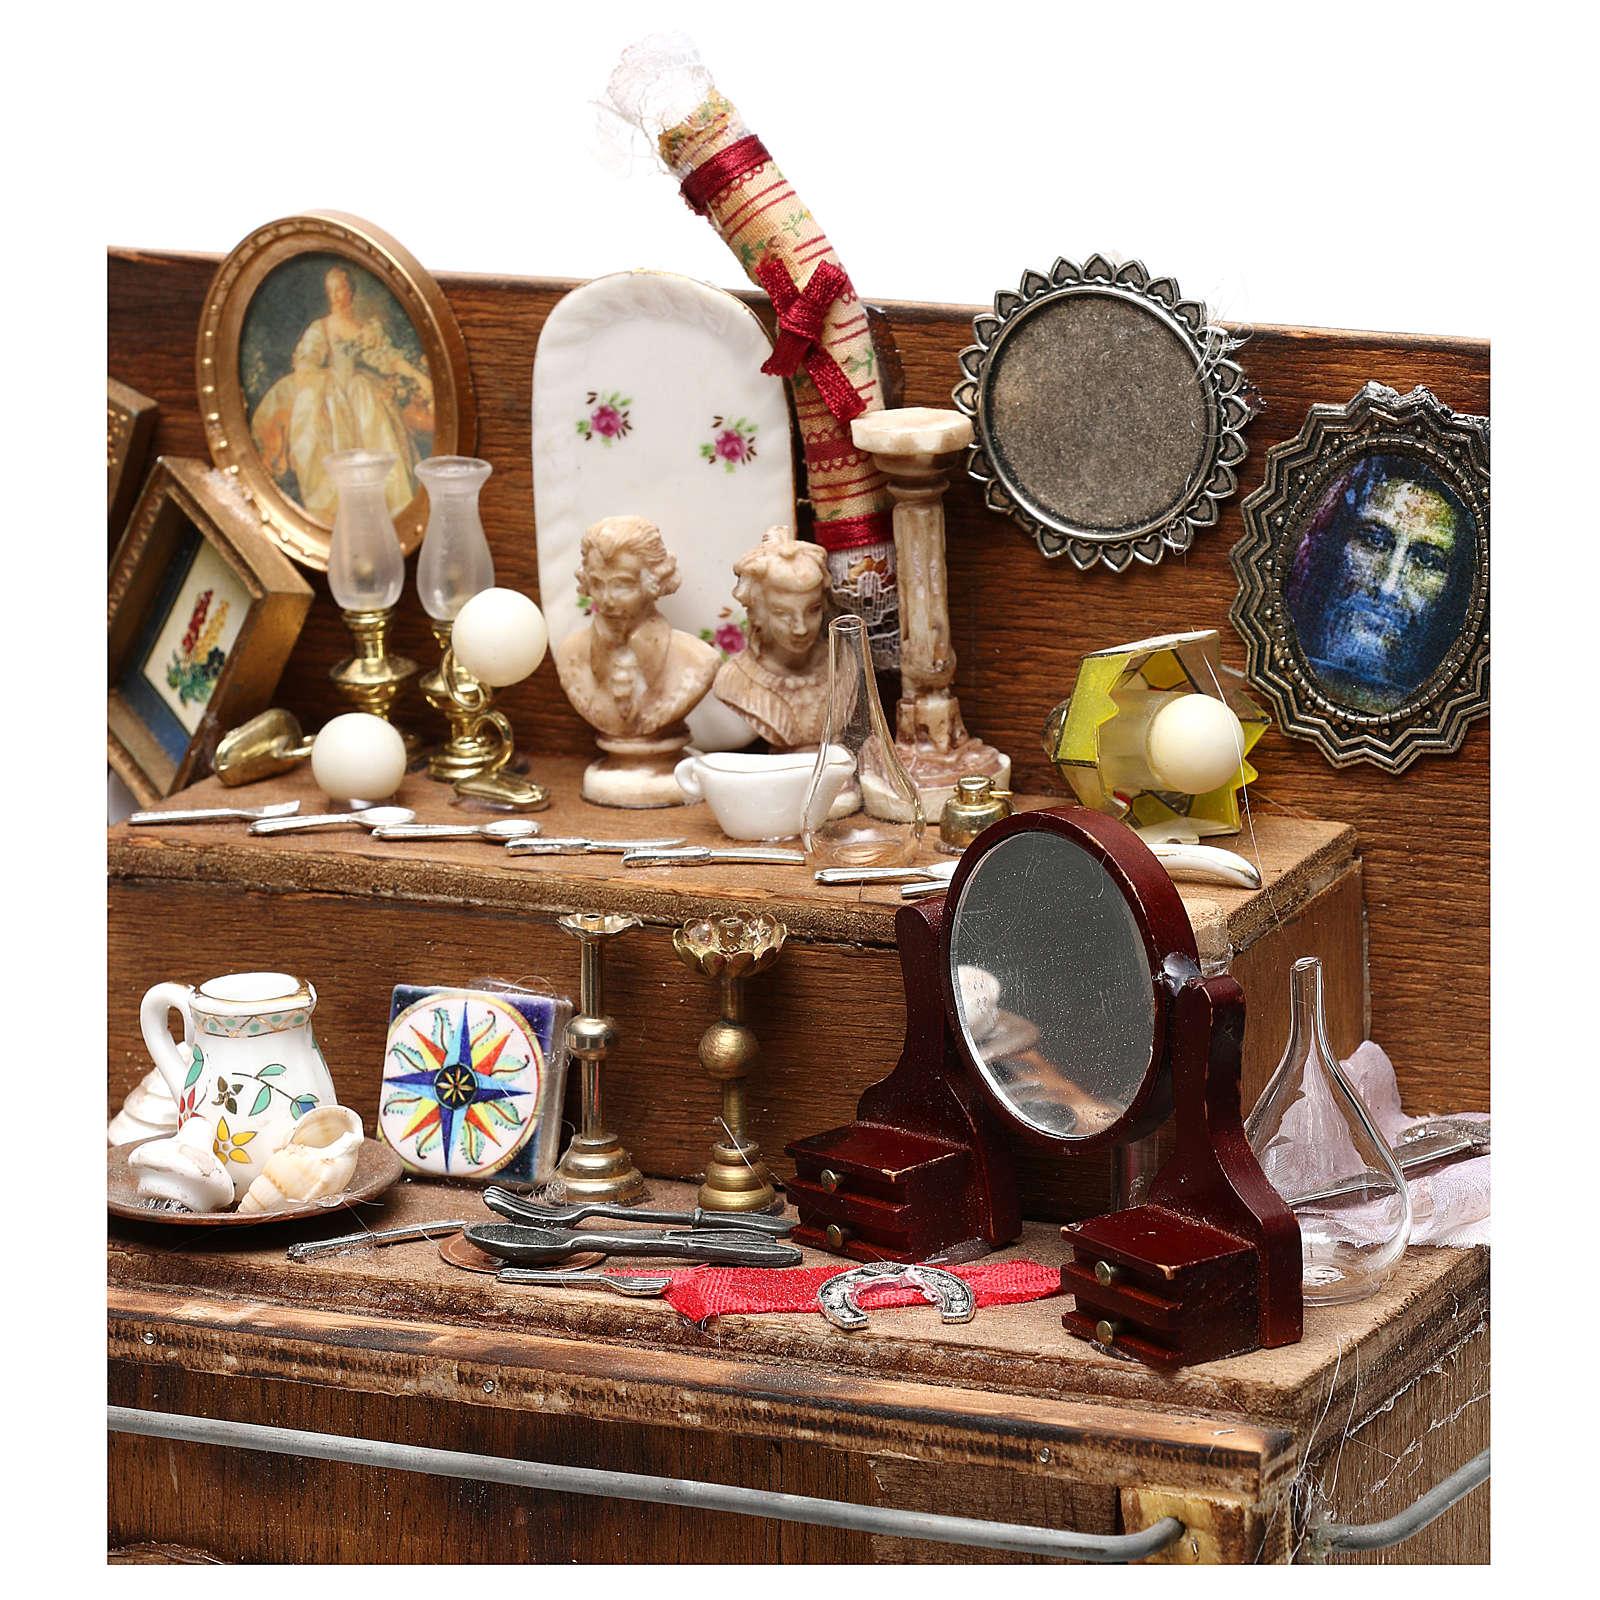 Neapolitan Nativity scene, secondhand dealer cart 18-22 cm 4